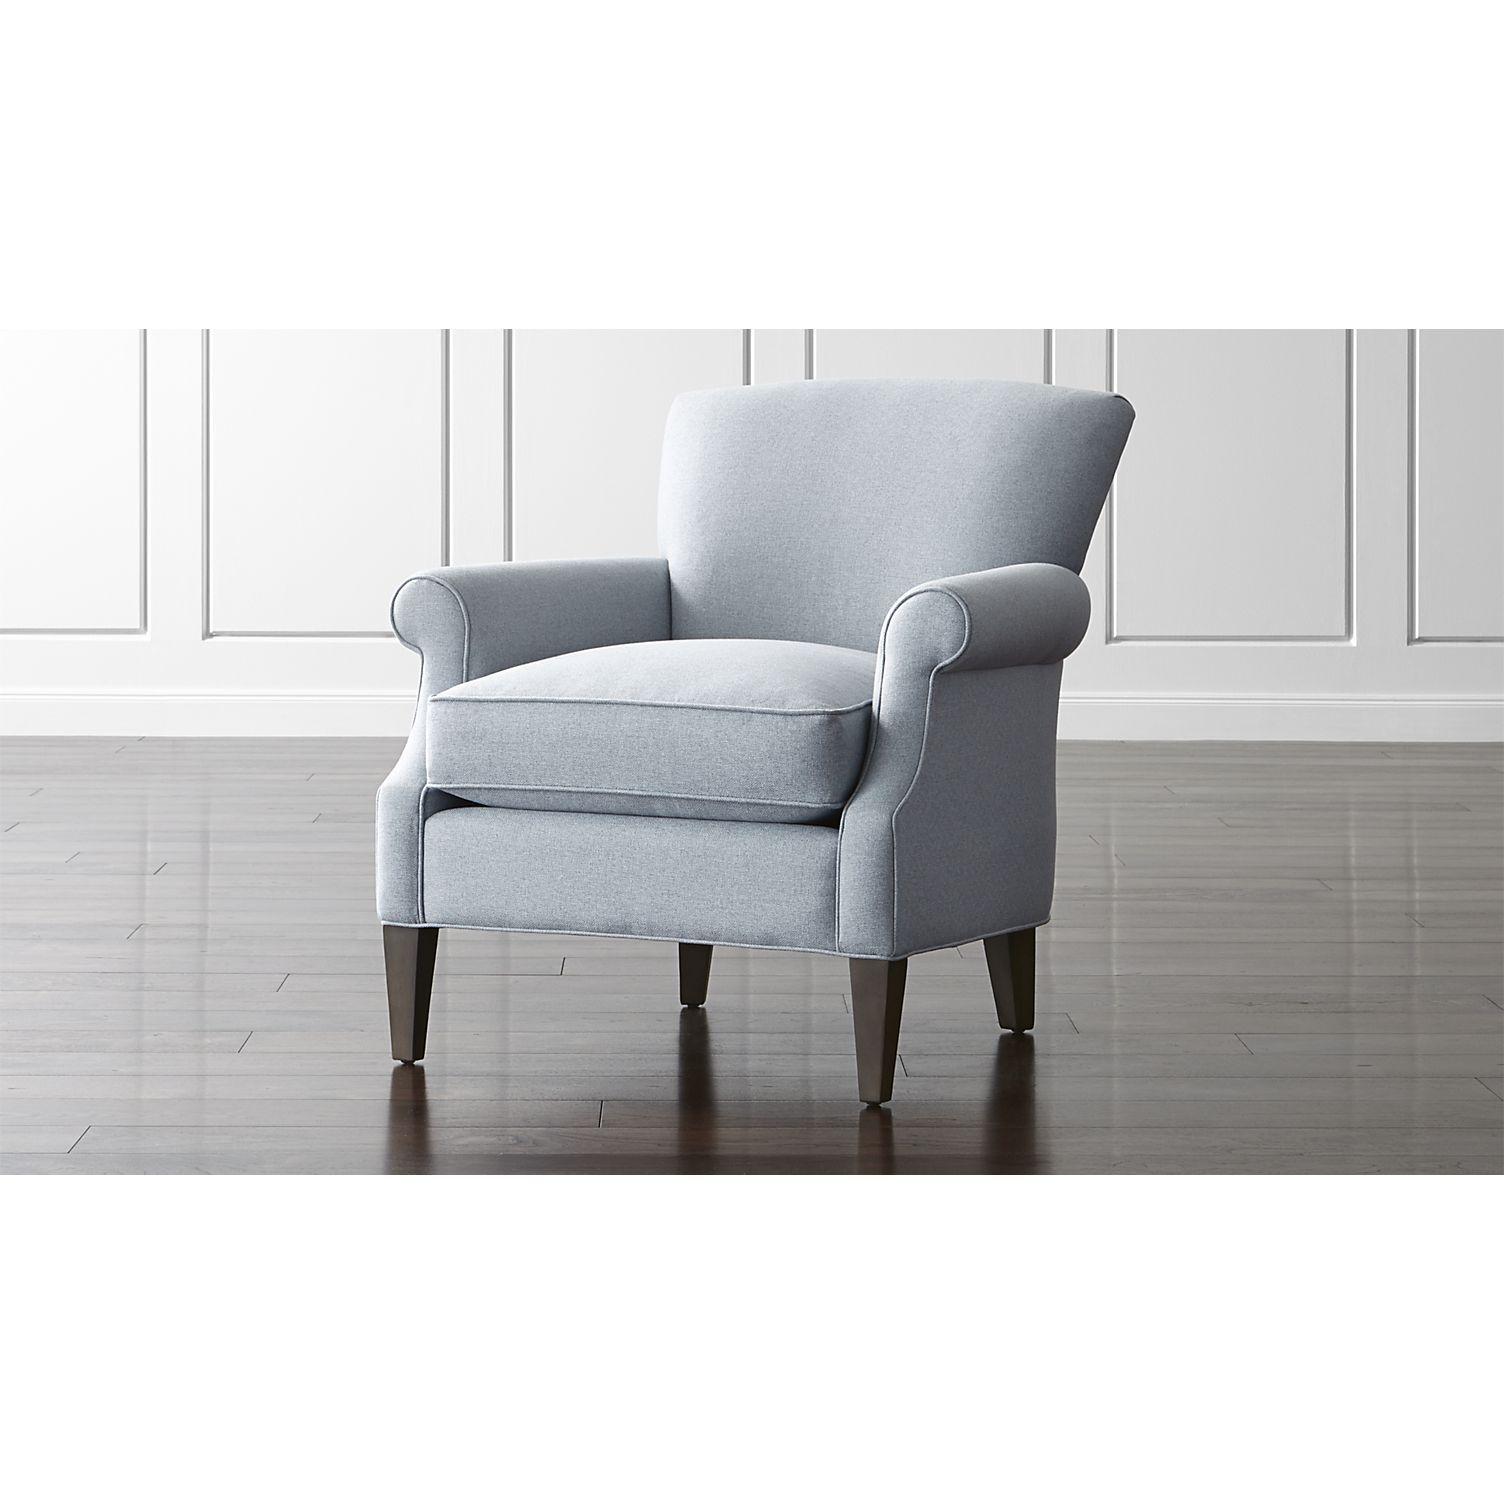 Best Shop Elyse Light Blue Accent Chair Self Welting Detail 400 x 300